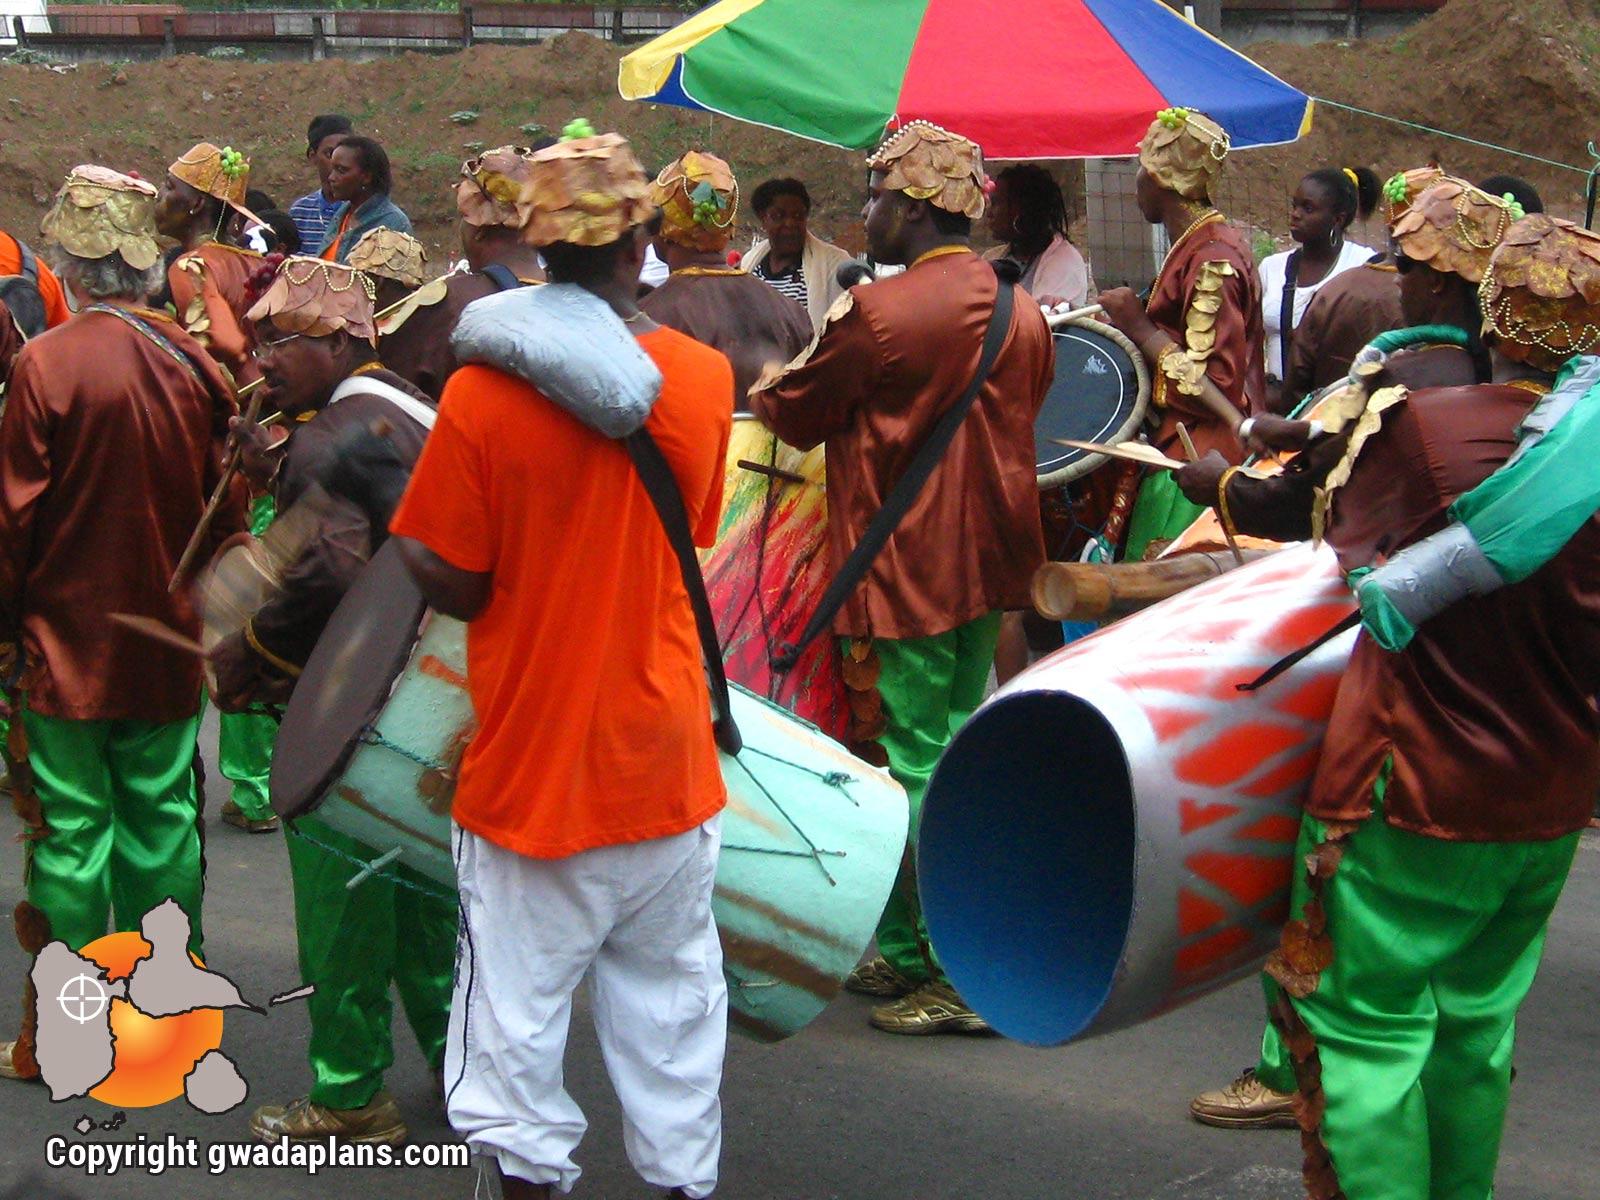 Carnaval Guadeloupe - Masse